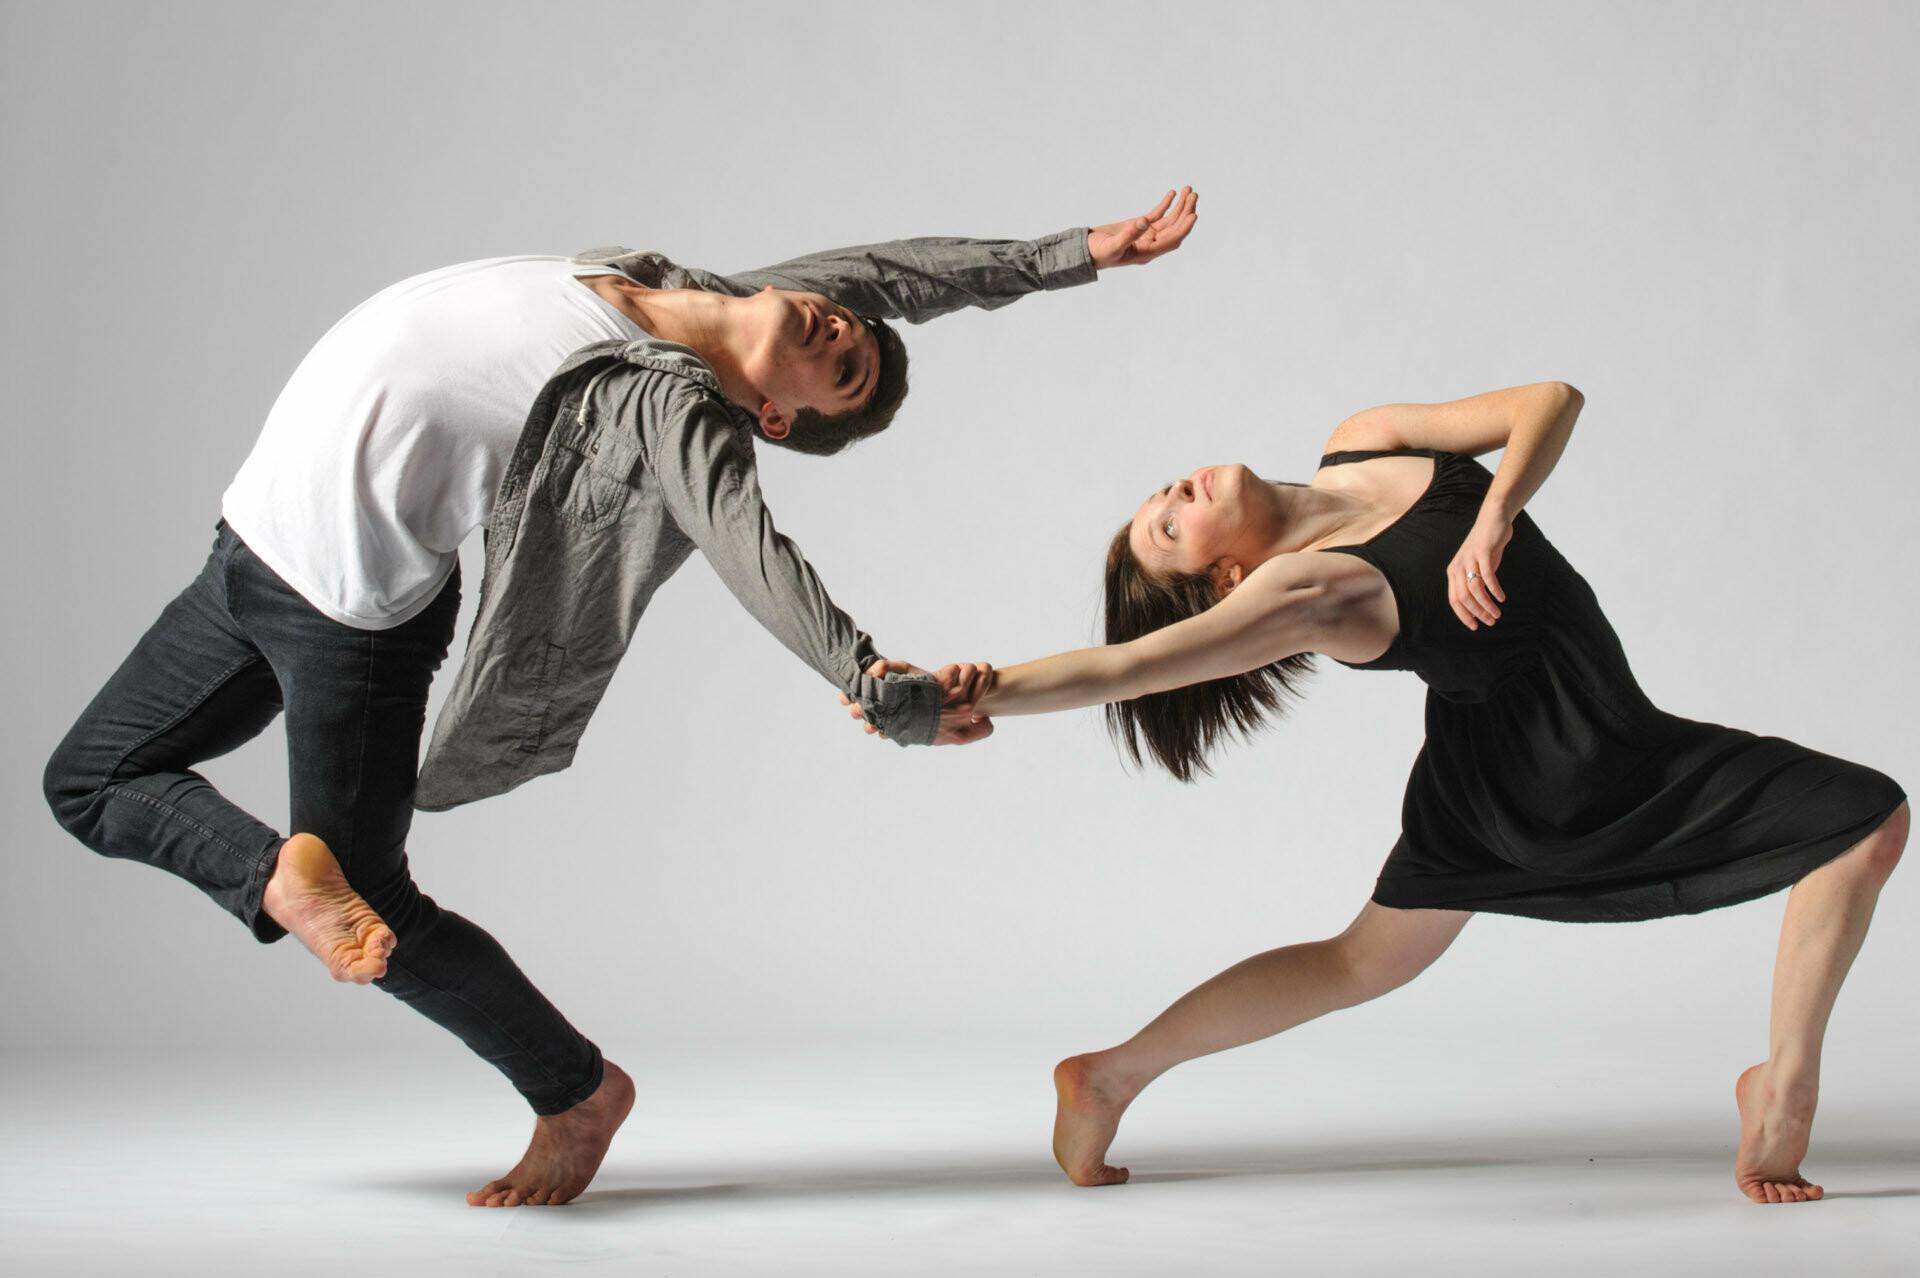 танцы одесса контемп контемпорари contemporary